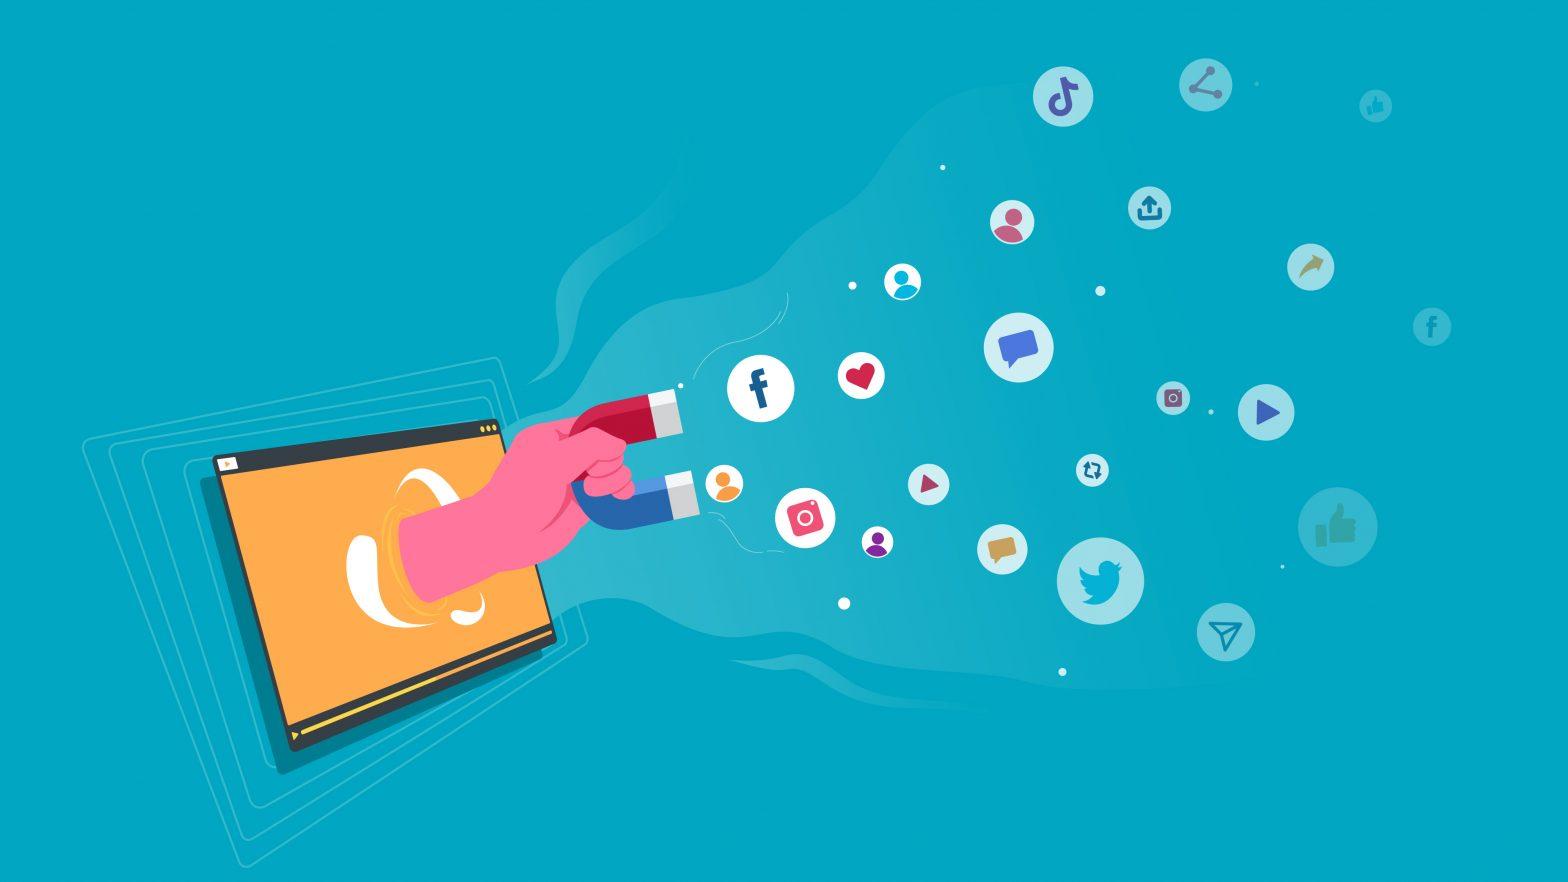 Capturing Attention on Social Media Using Motion Graphics